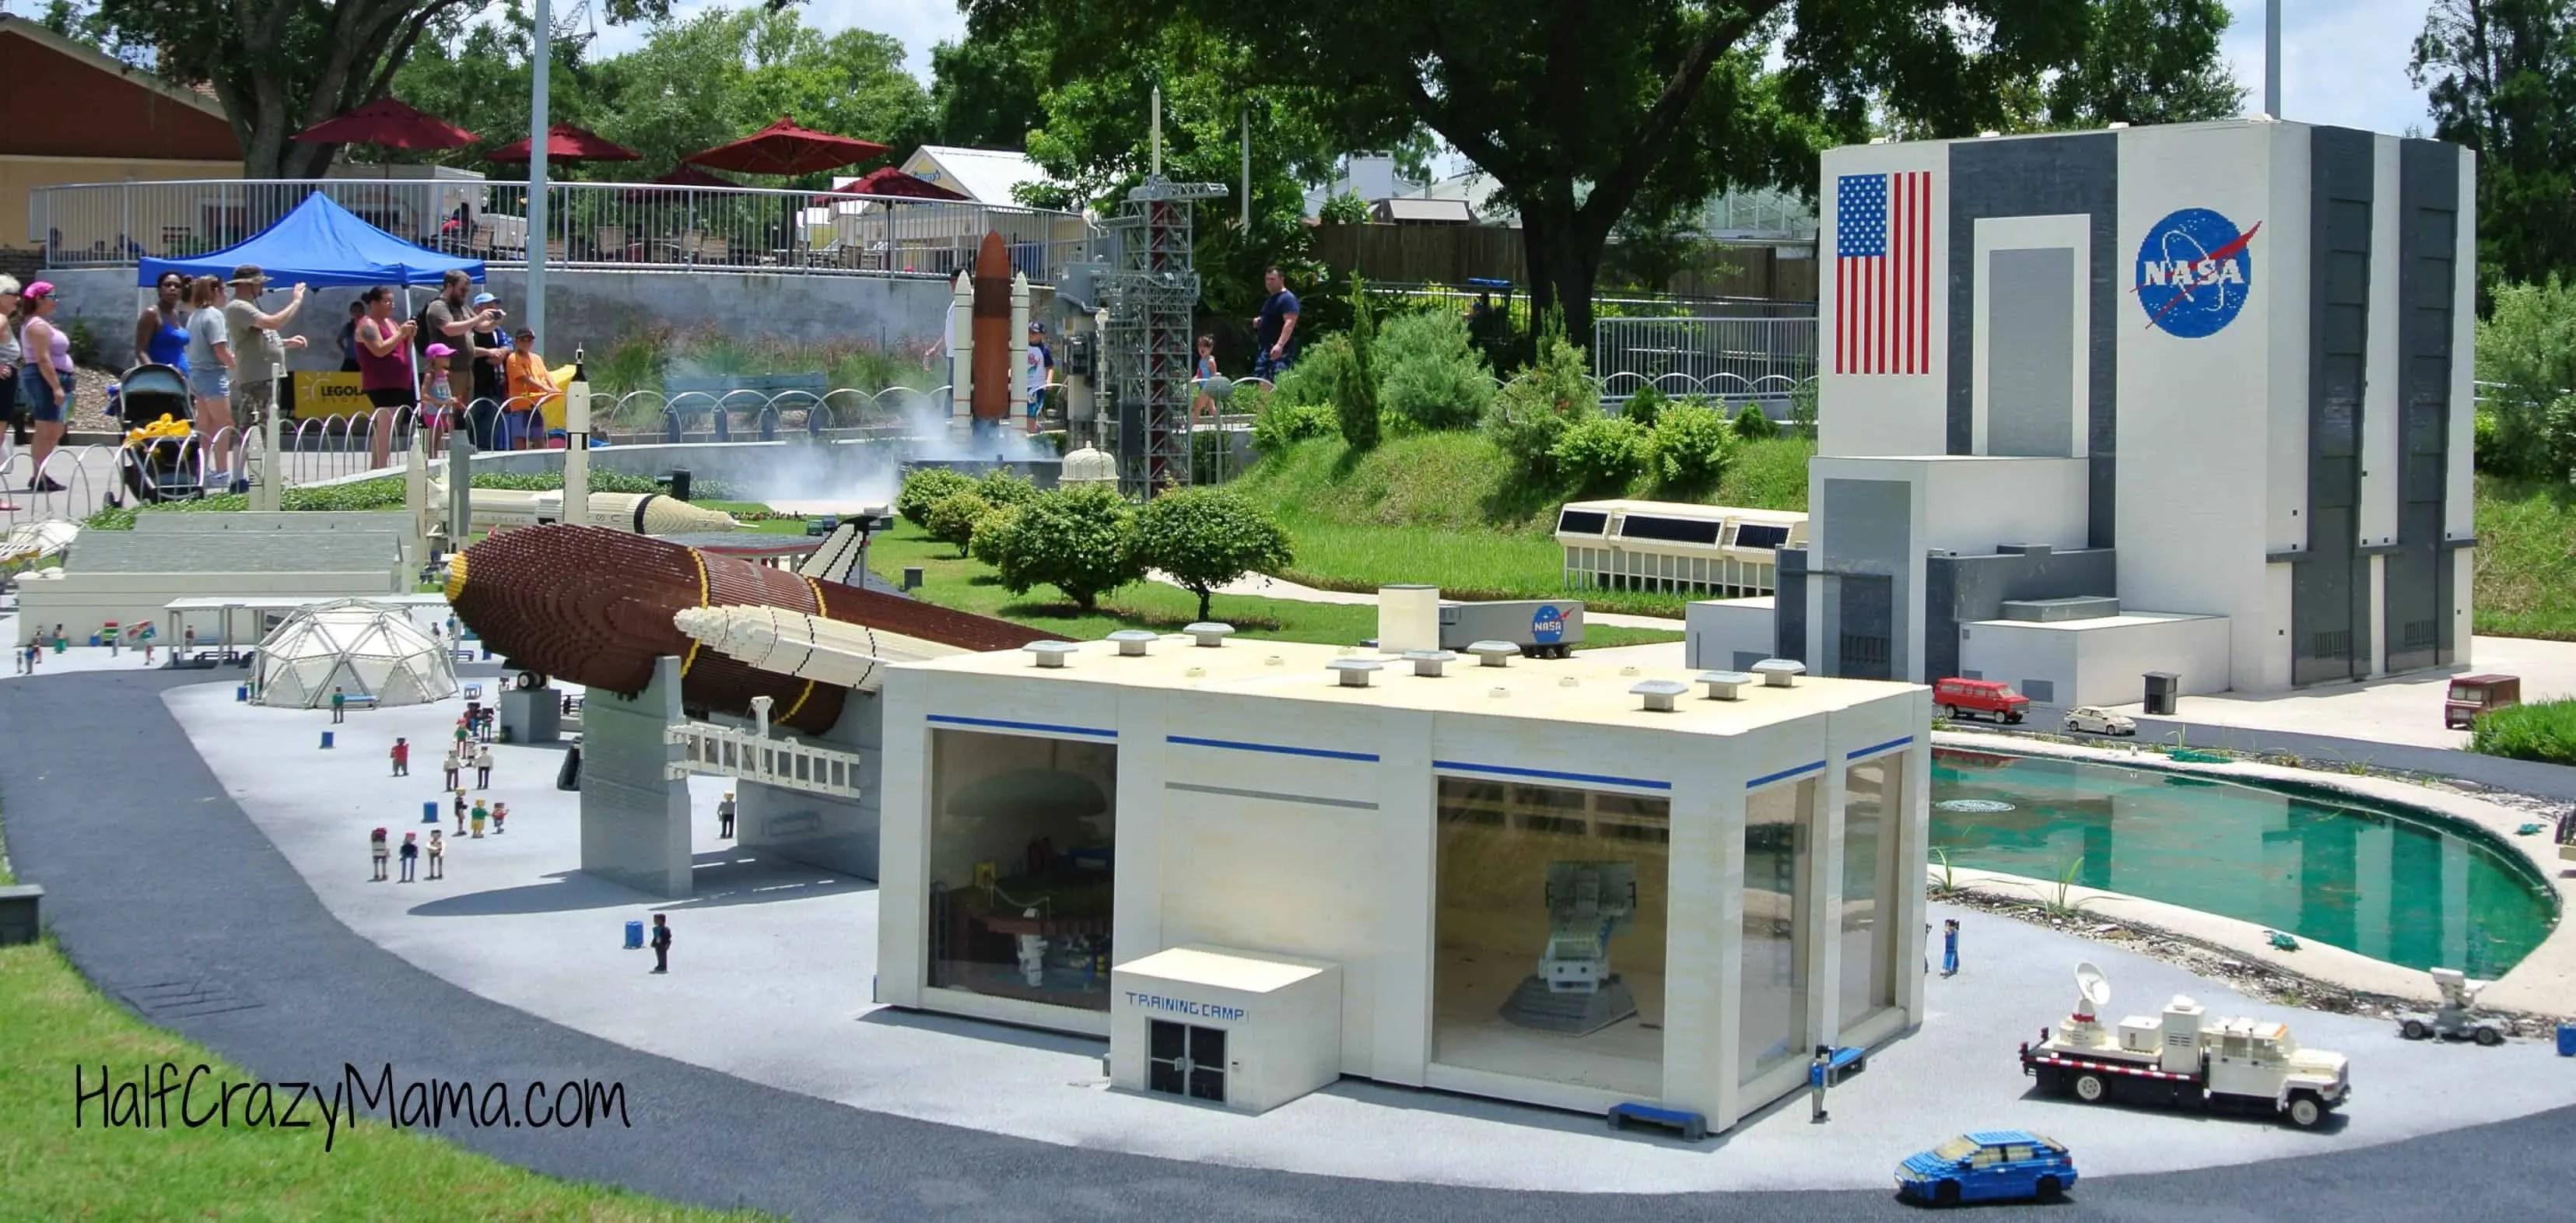 legoland Kennedy Space Center